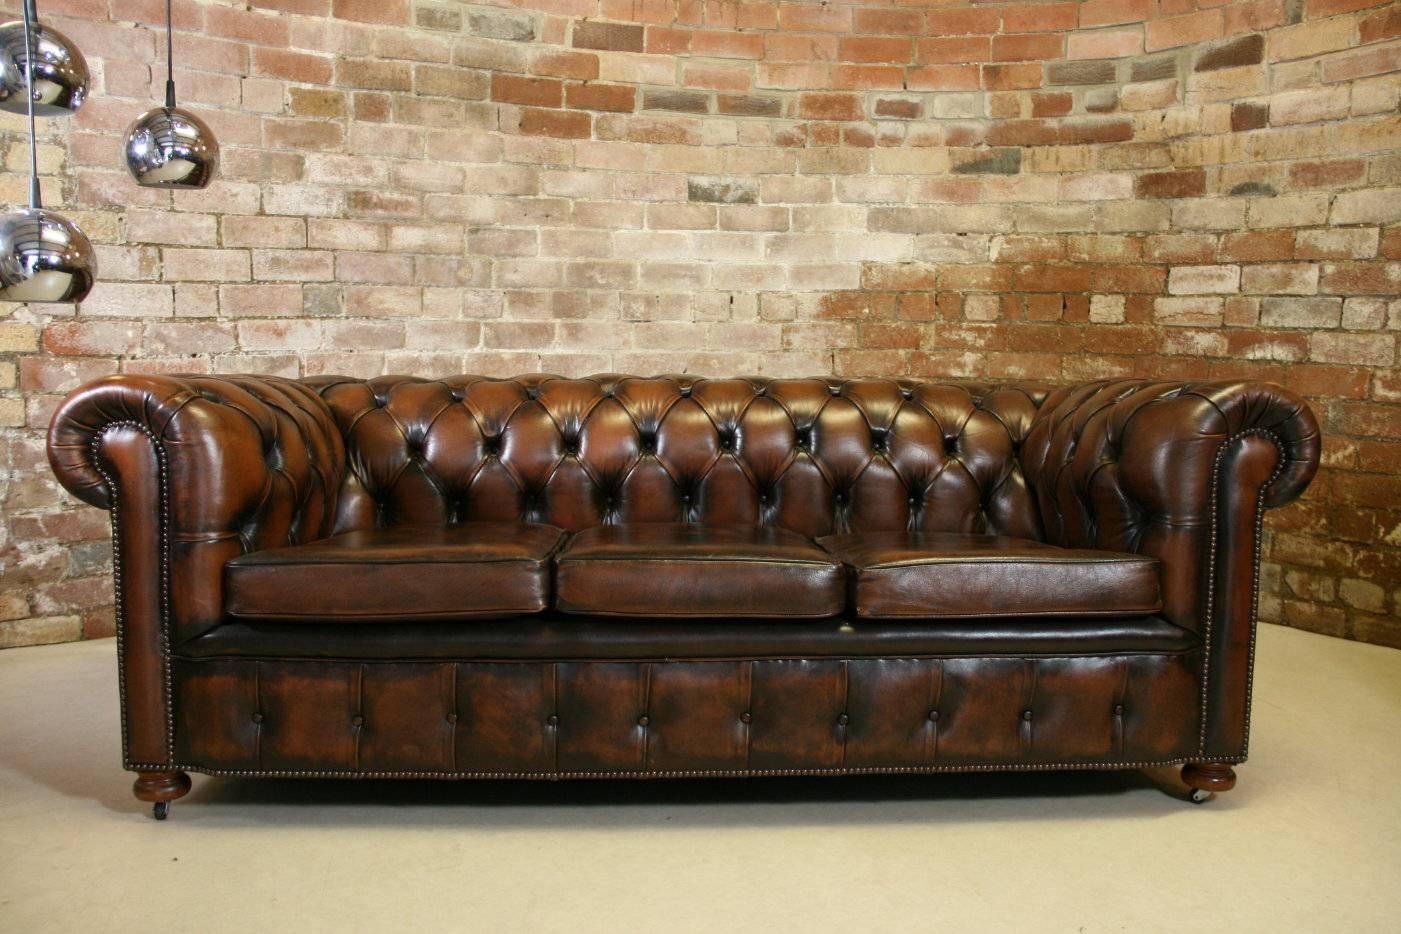 Antique Chesterfield Sofa Beauty No7 | Umpsa 78 Sofas intended for Vintage Chesterfield Sofas (Image 1 of 30)